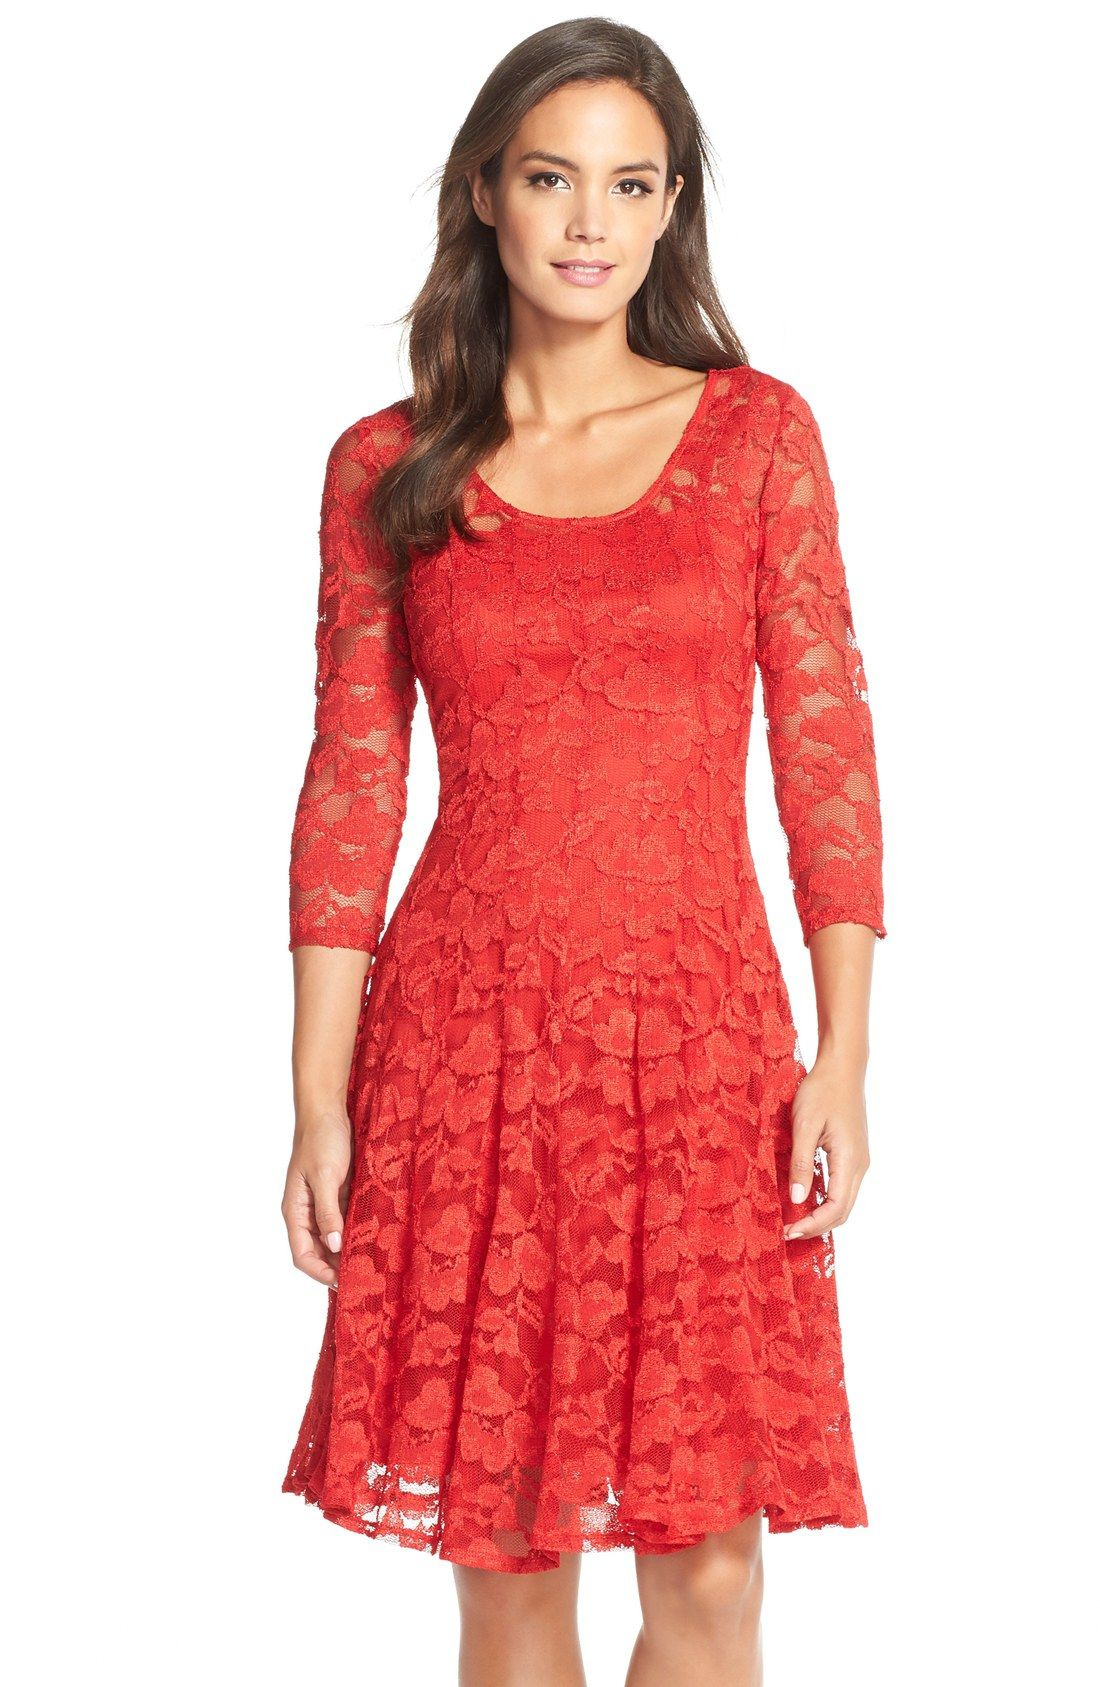 Cheetah b red dress wedding dress pinterest lace cocktails